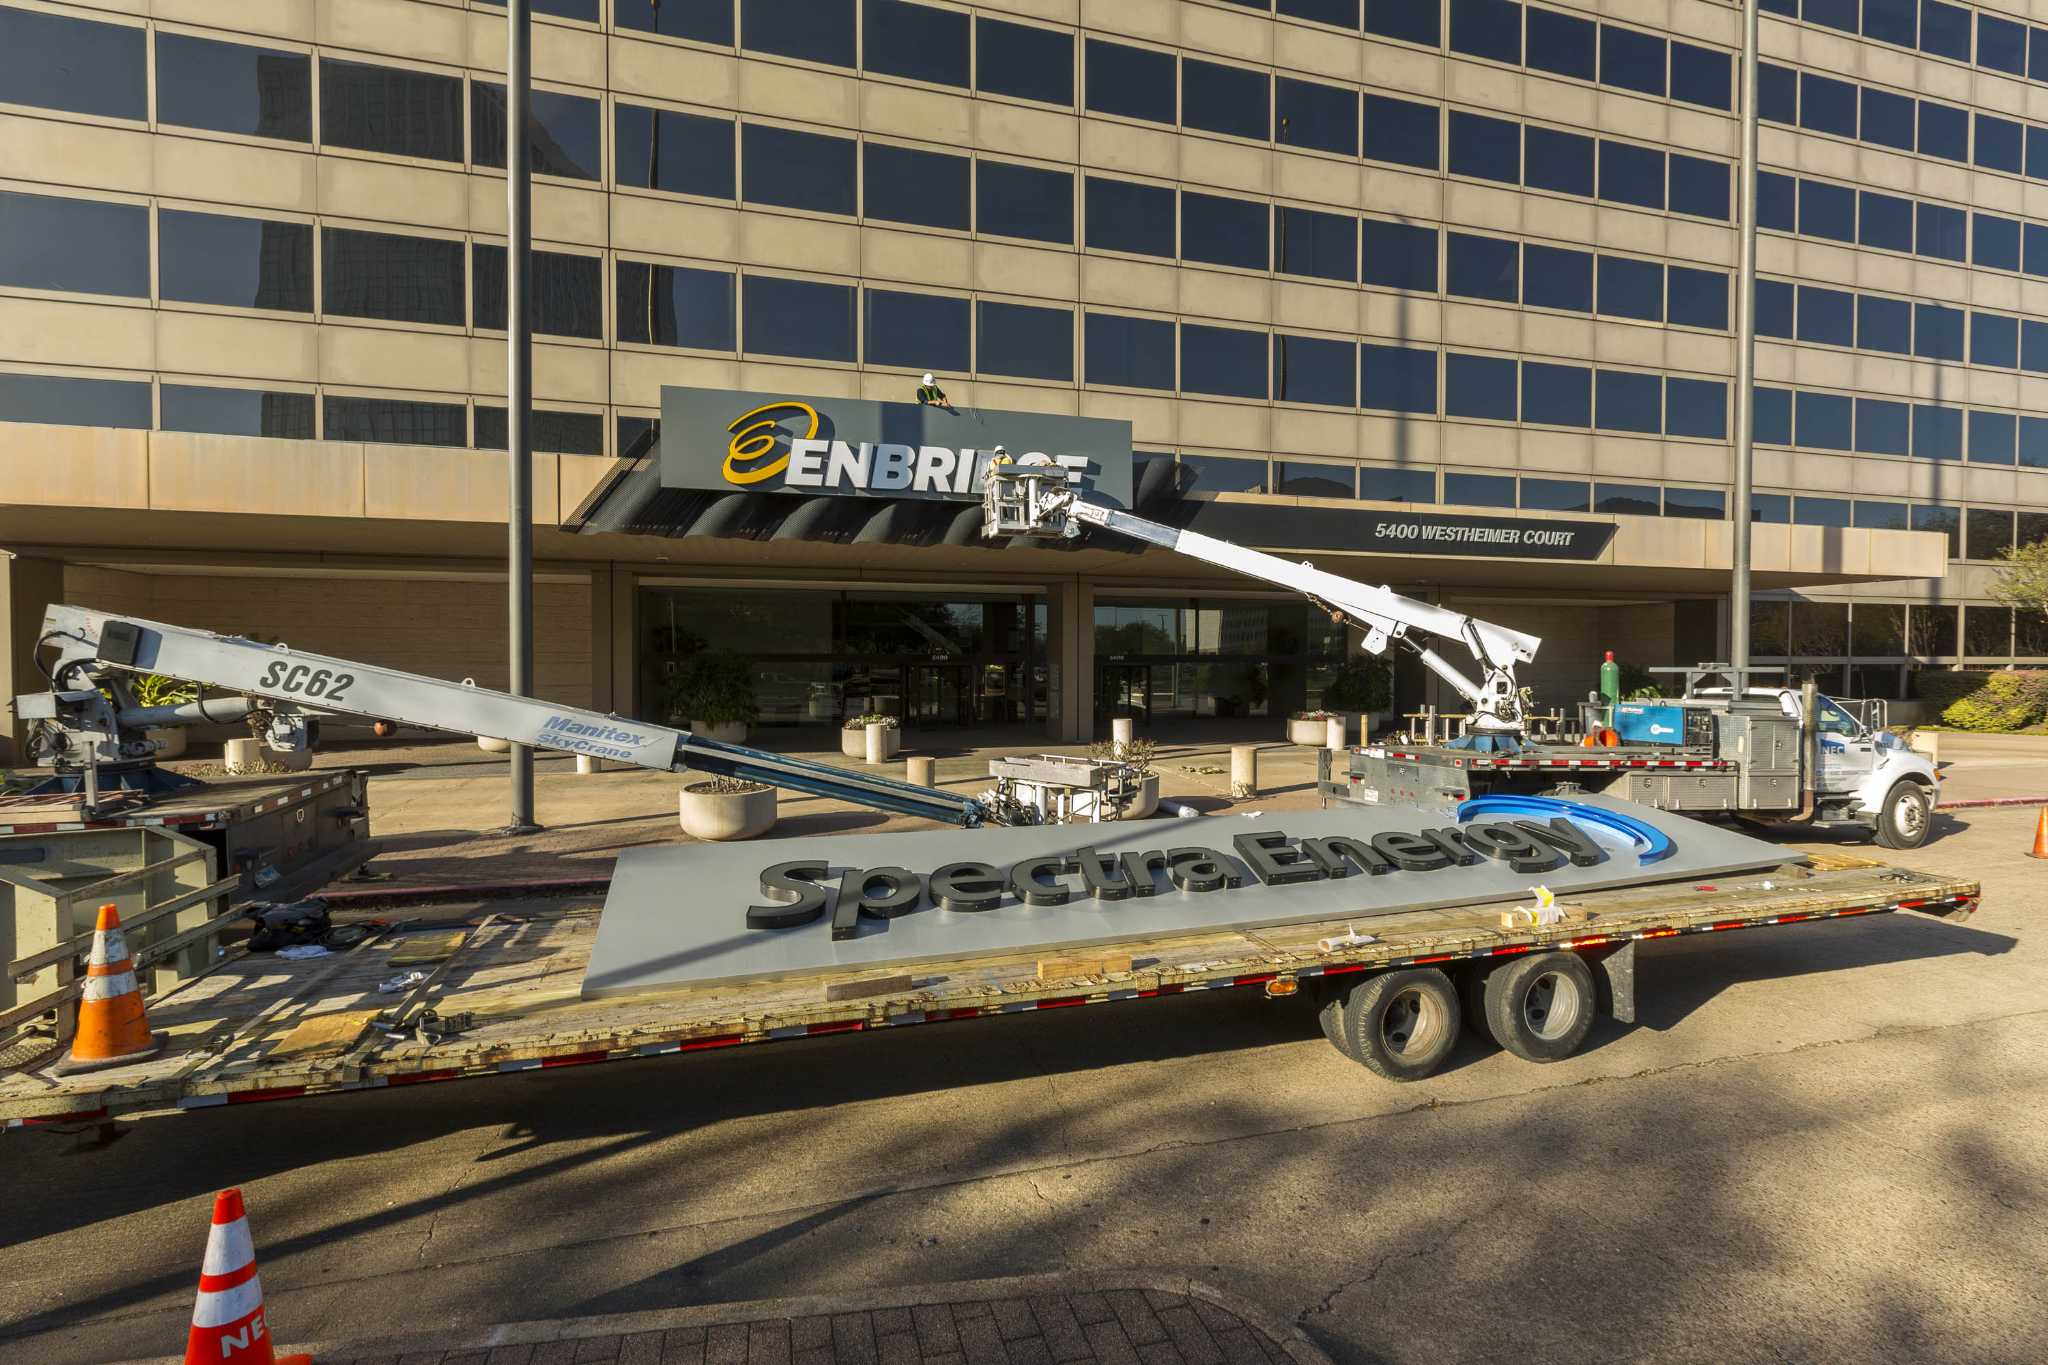 Enbridge completes buyout of Houston's Spectra Energy